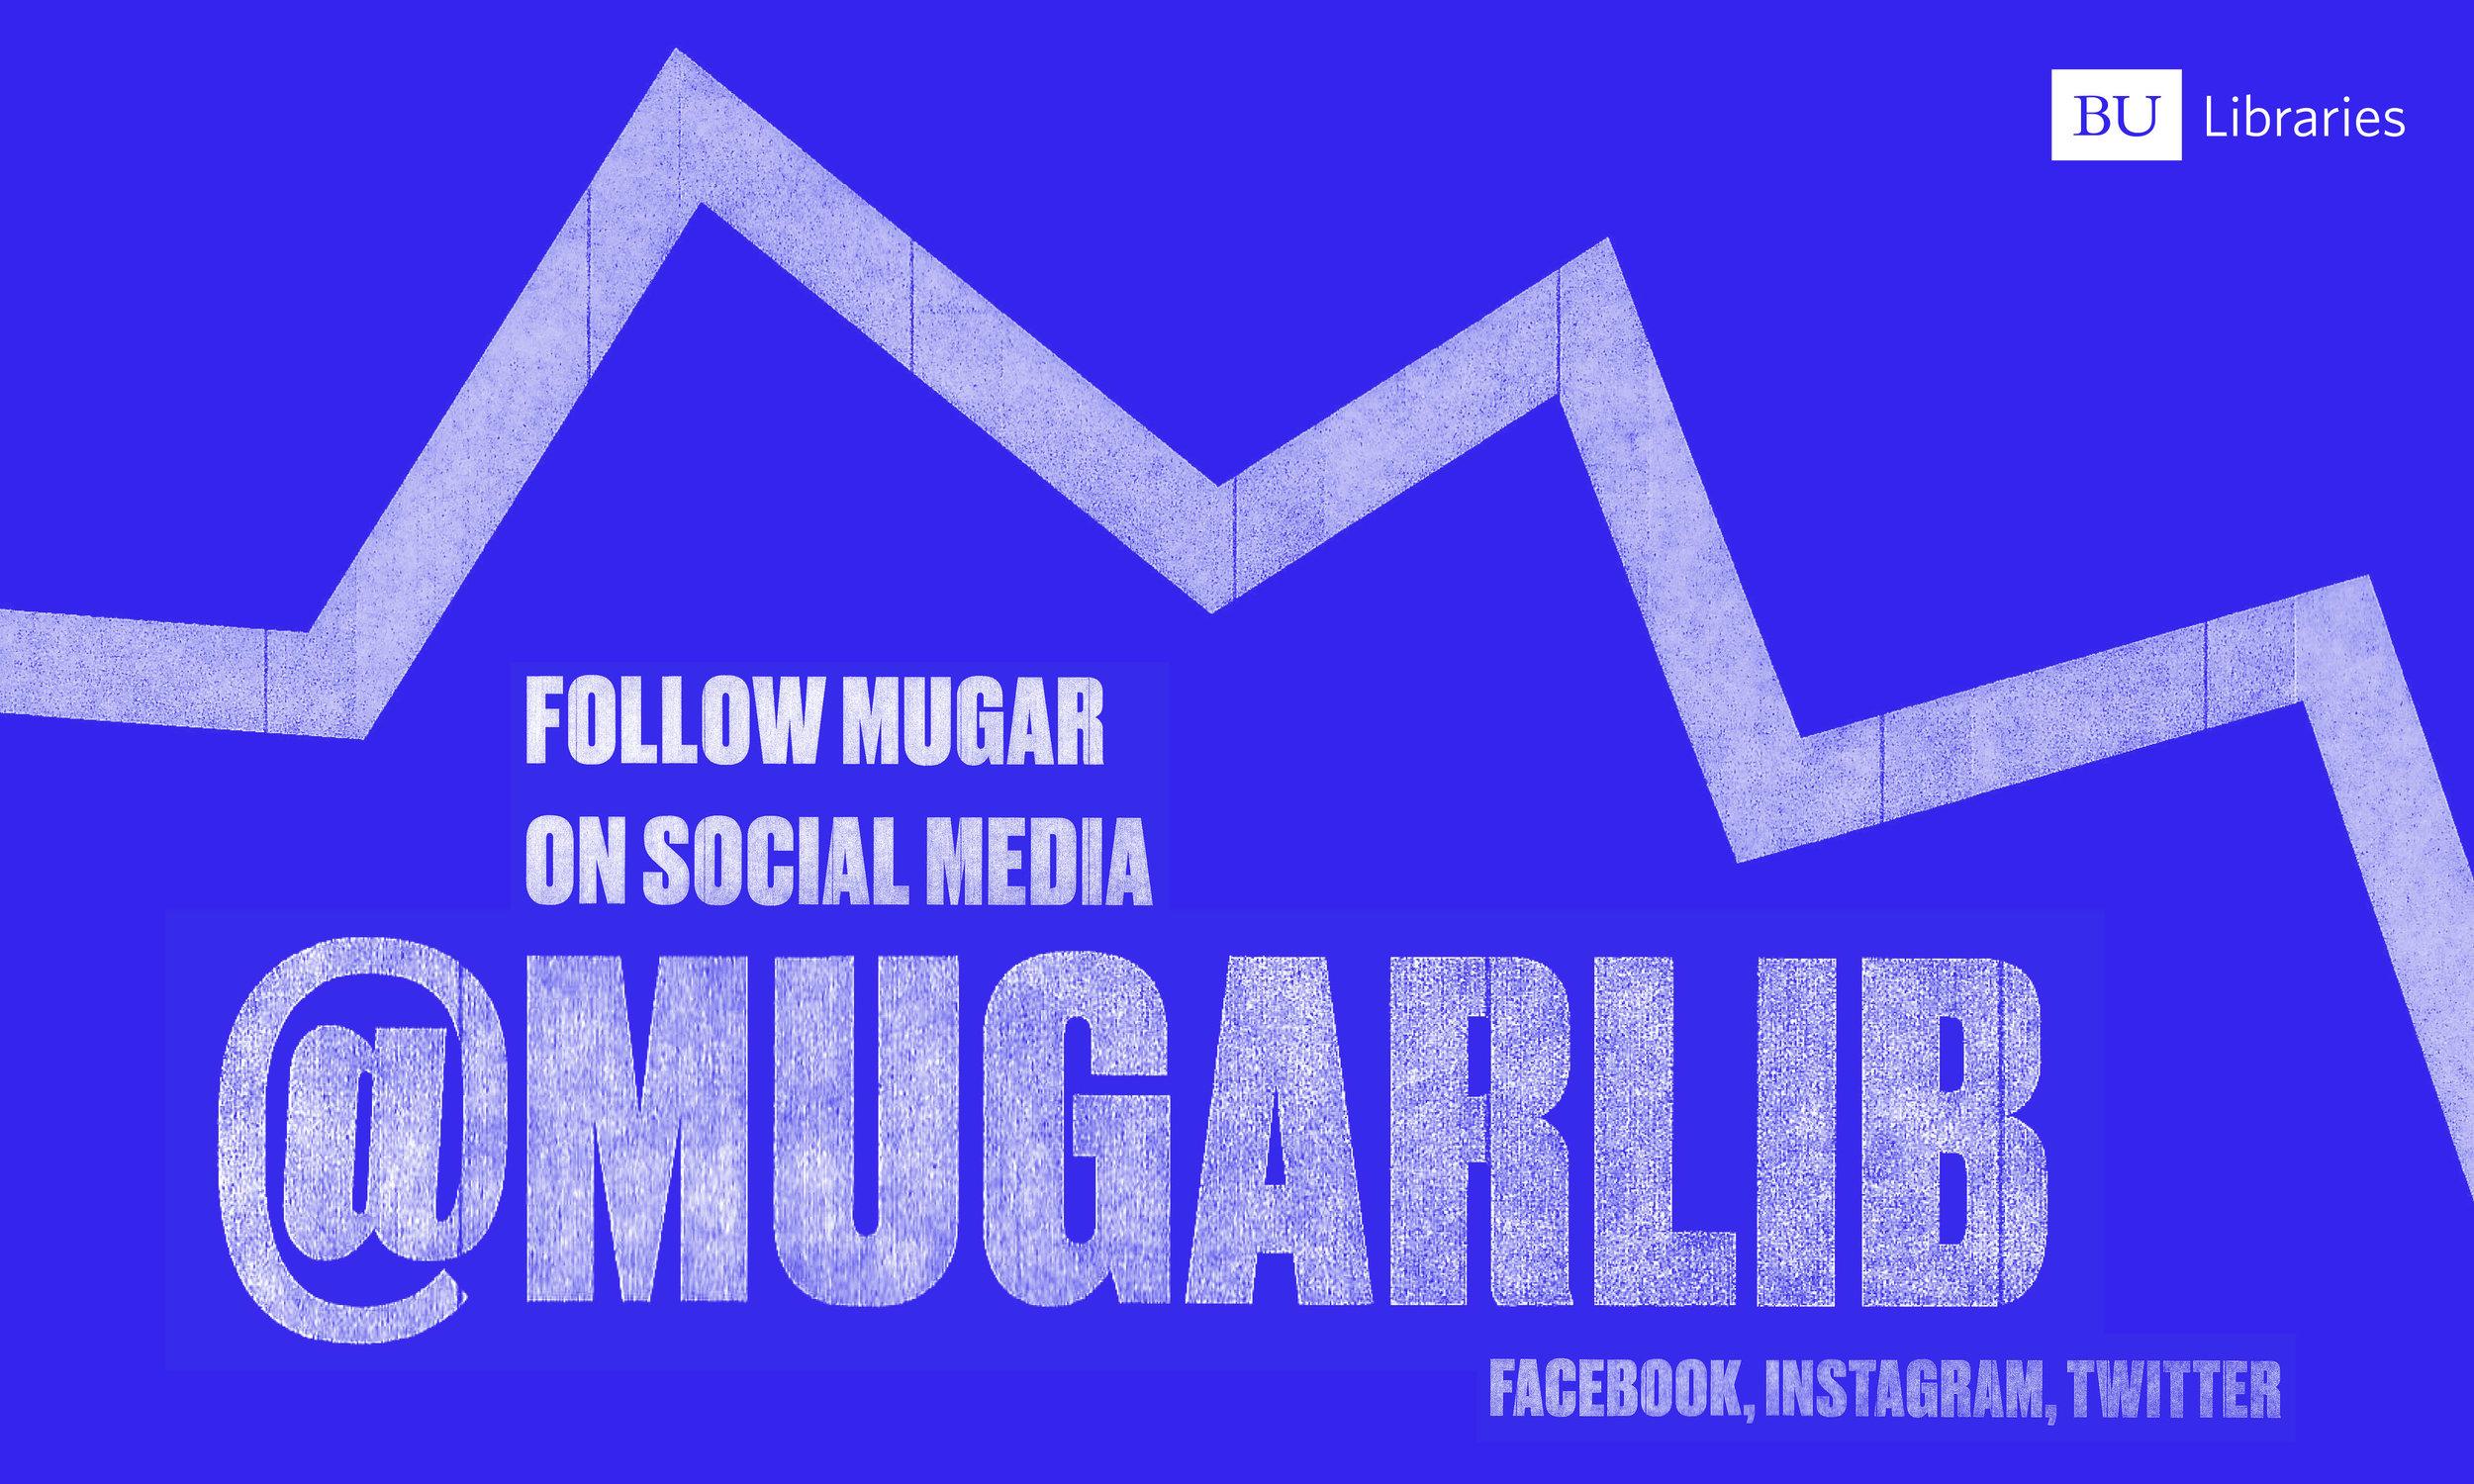 Das_MugarSocialMedia_DigitalDisplay.jpg